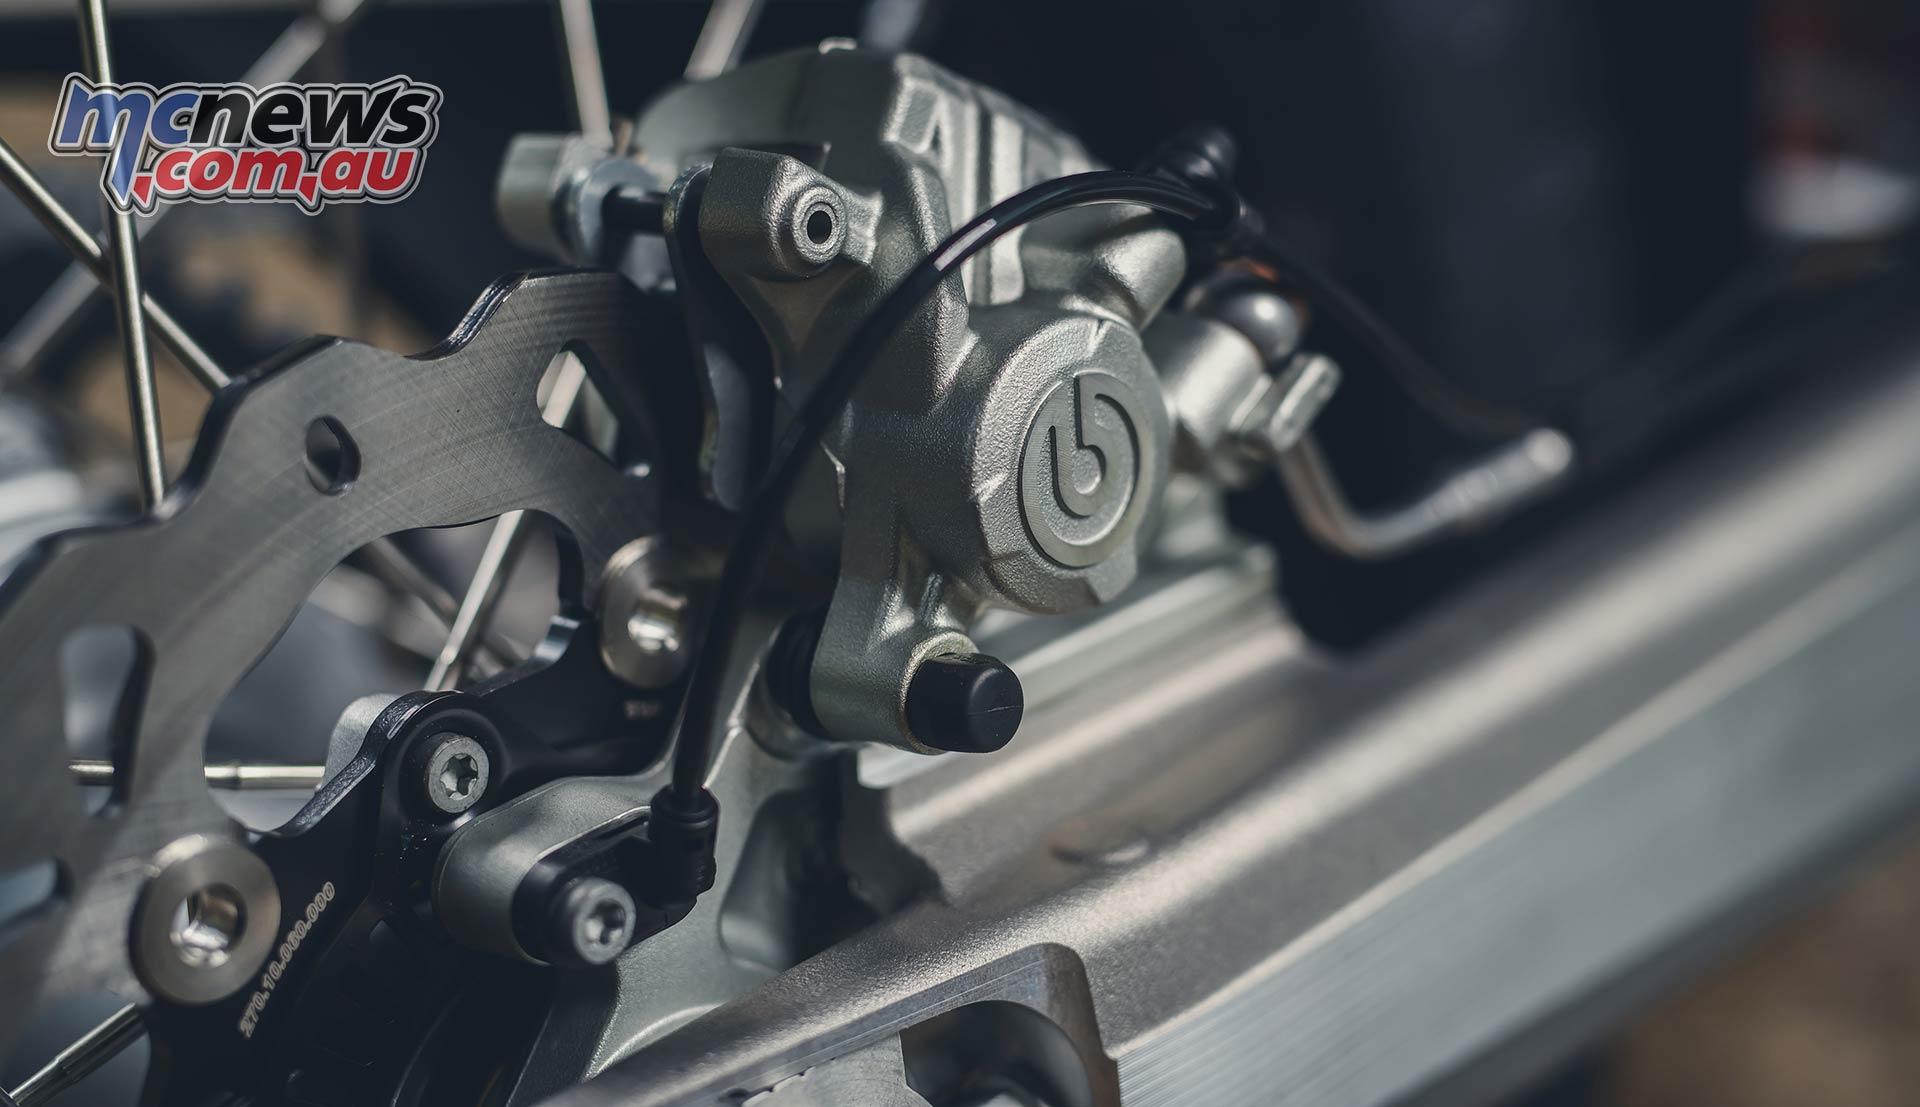 KTM Enduro R Portugal Brake Caliper Rear